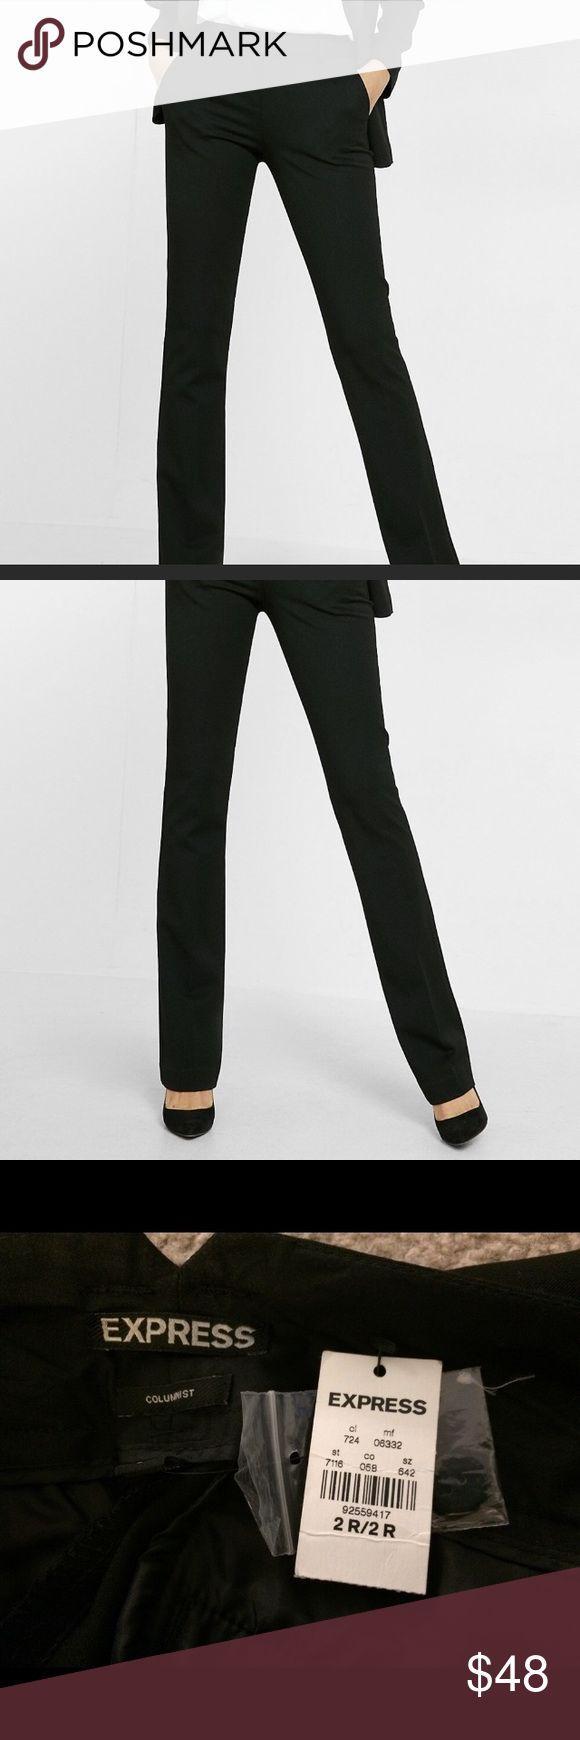 🆕 Express Columnist Pants Black Straight Leg Pants Express Pants Straight Leg